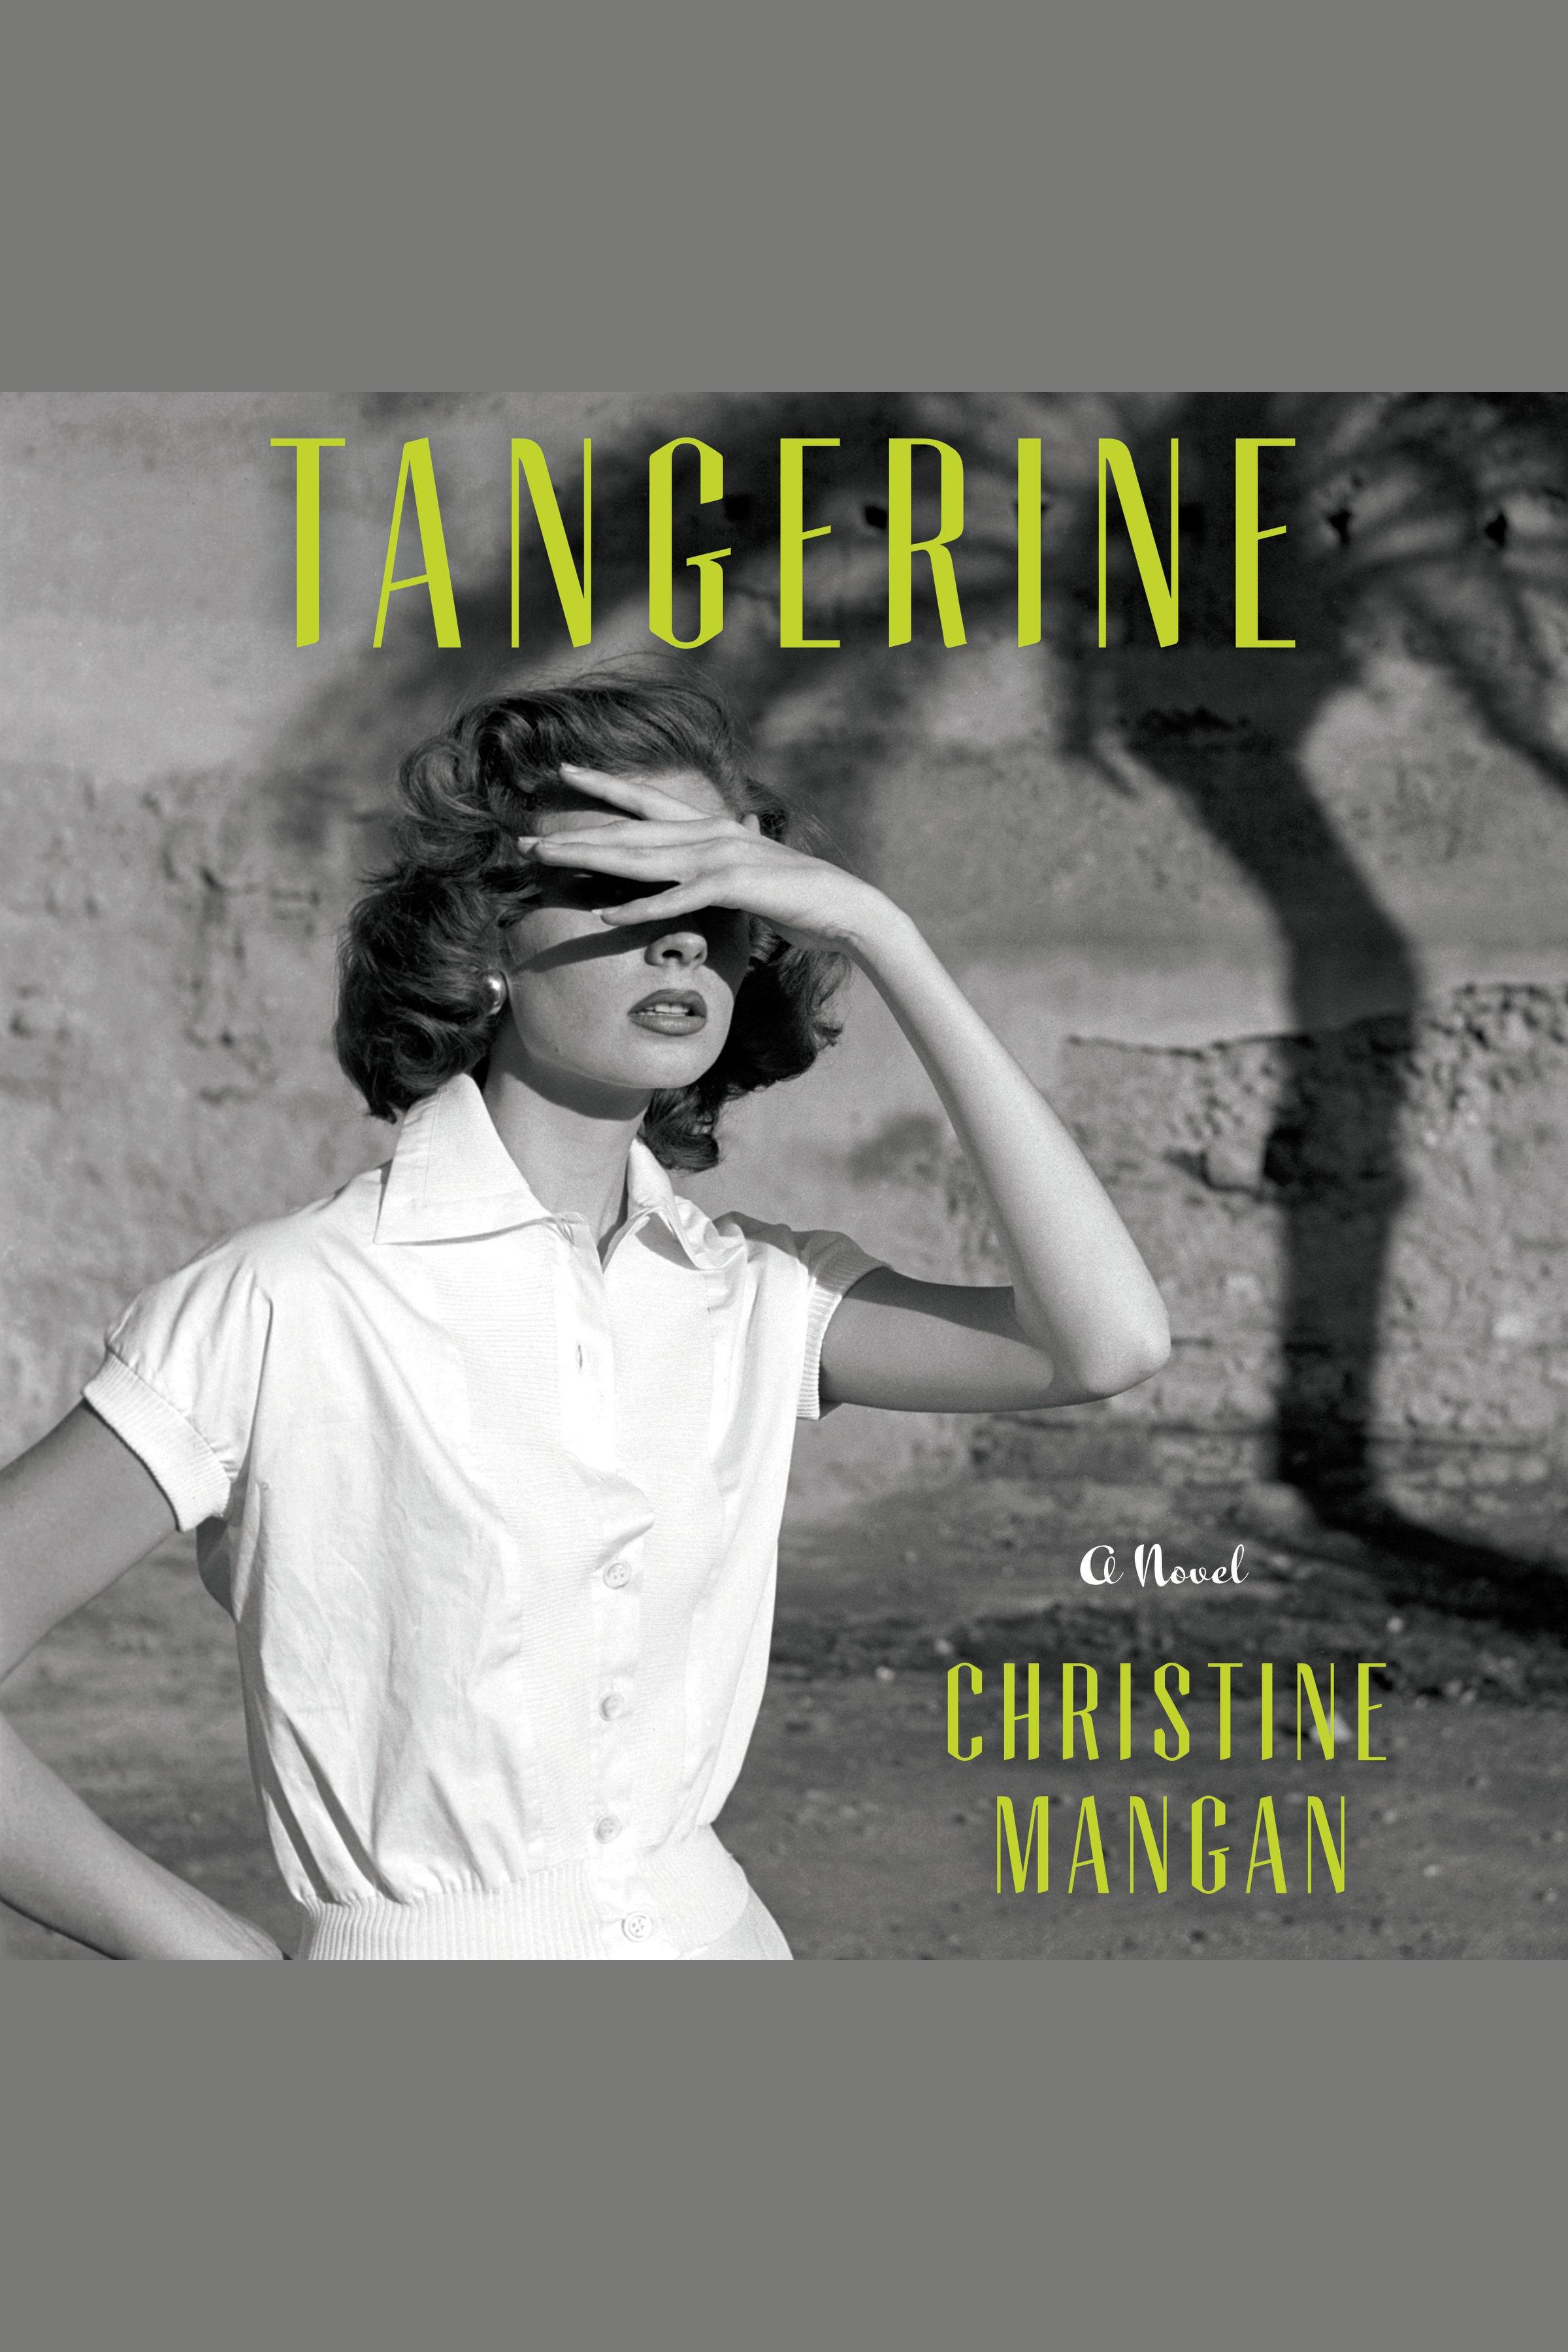 Tangerine [electronic resource]